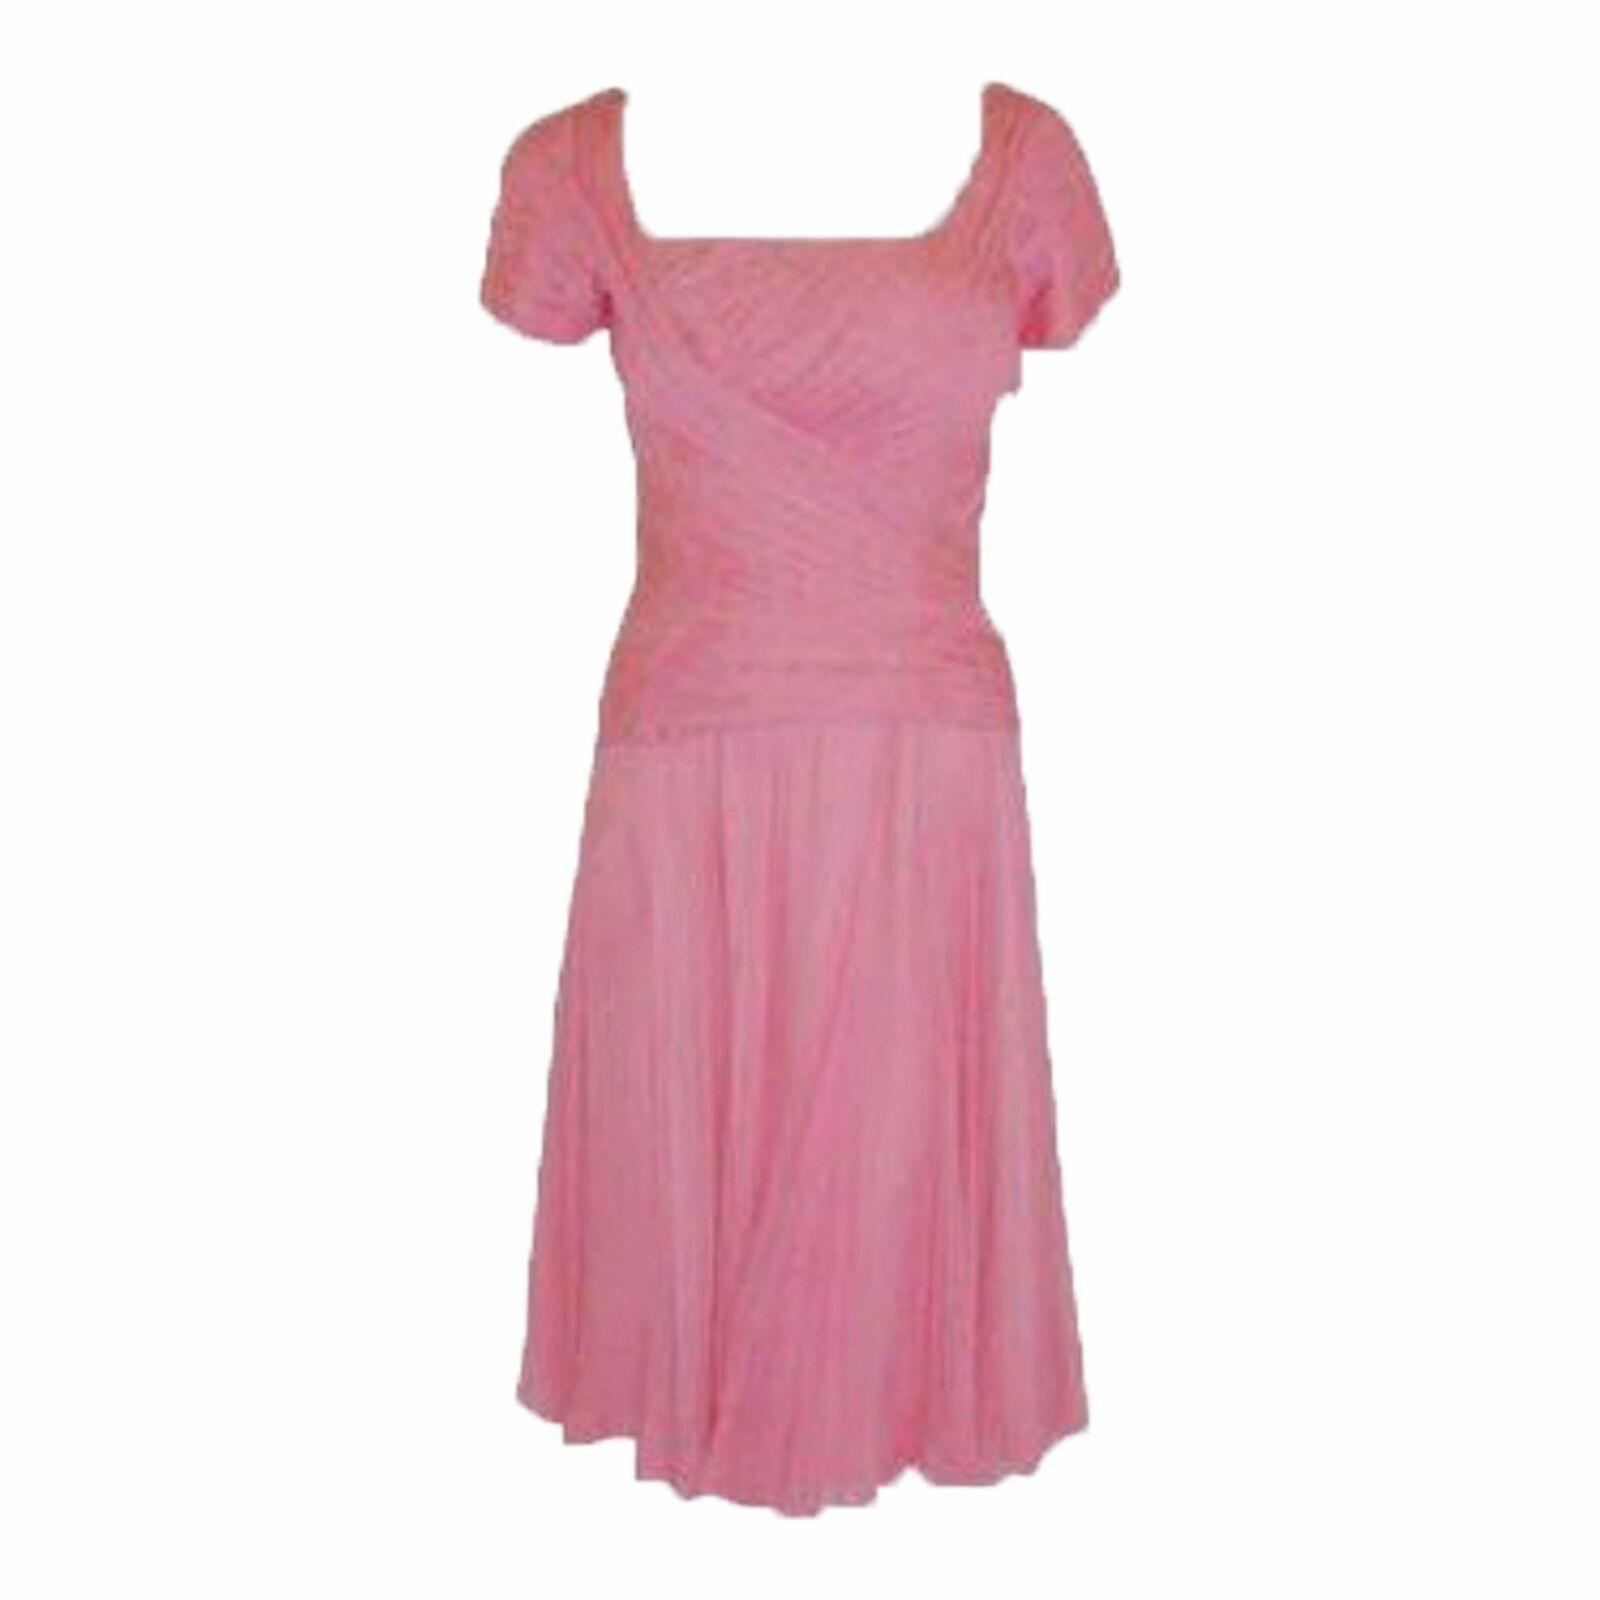 CEIL CHAPMAN 1960s Pink Chiffon Bodice Cocktail D… - image 1